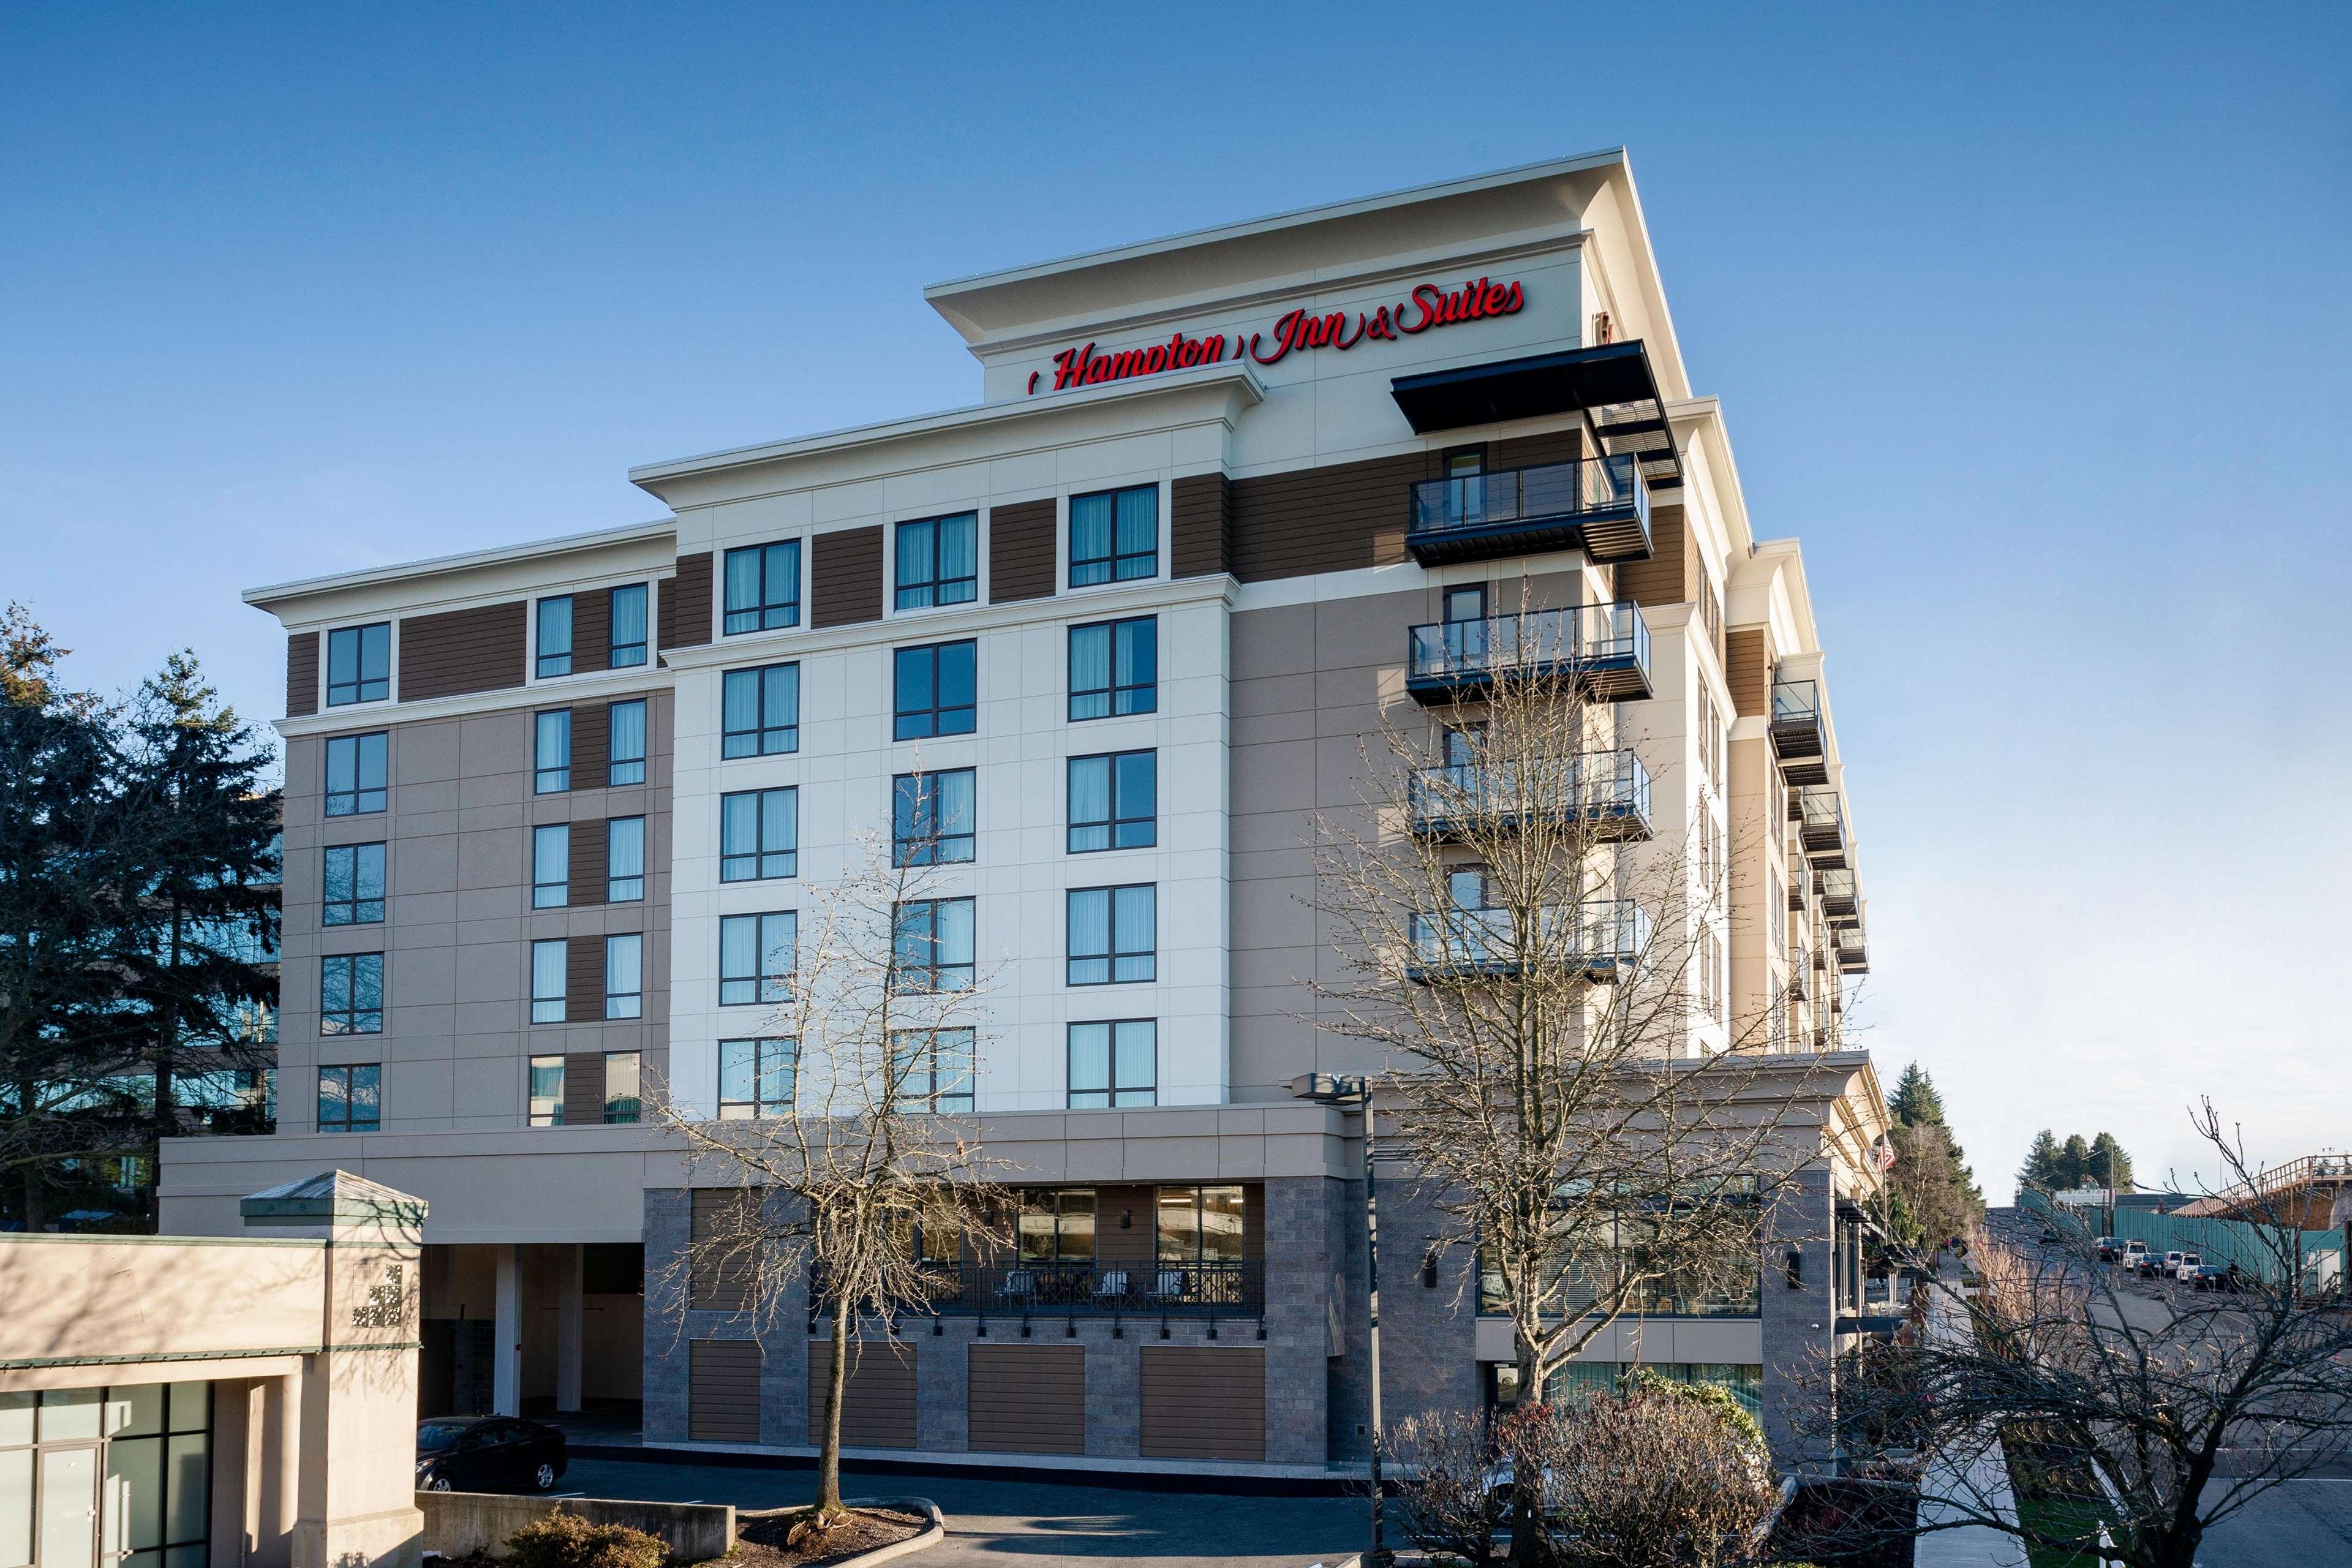 Hampton Inn & Suites by Hilton Seattle/Northgate image 43